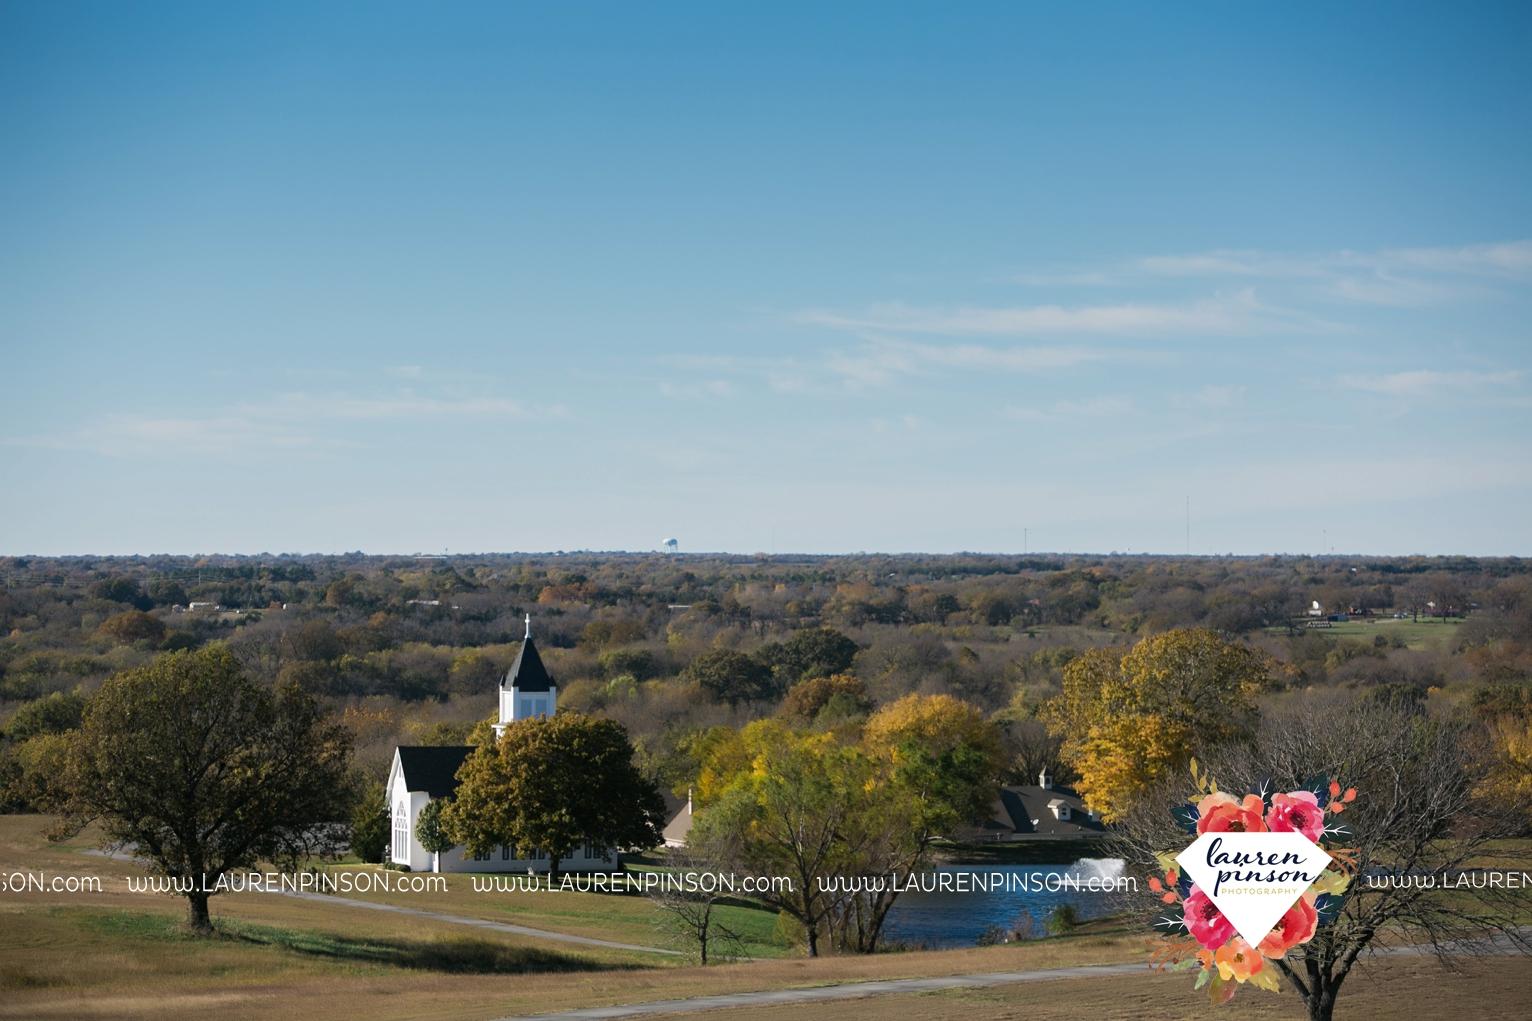 bells-texas-wedding-photography-at-willowood-ranch-chapel-north-texas-wichita-falls-wedding-photographer_1809.jpg